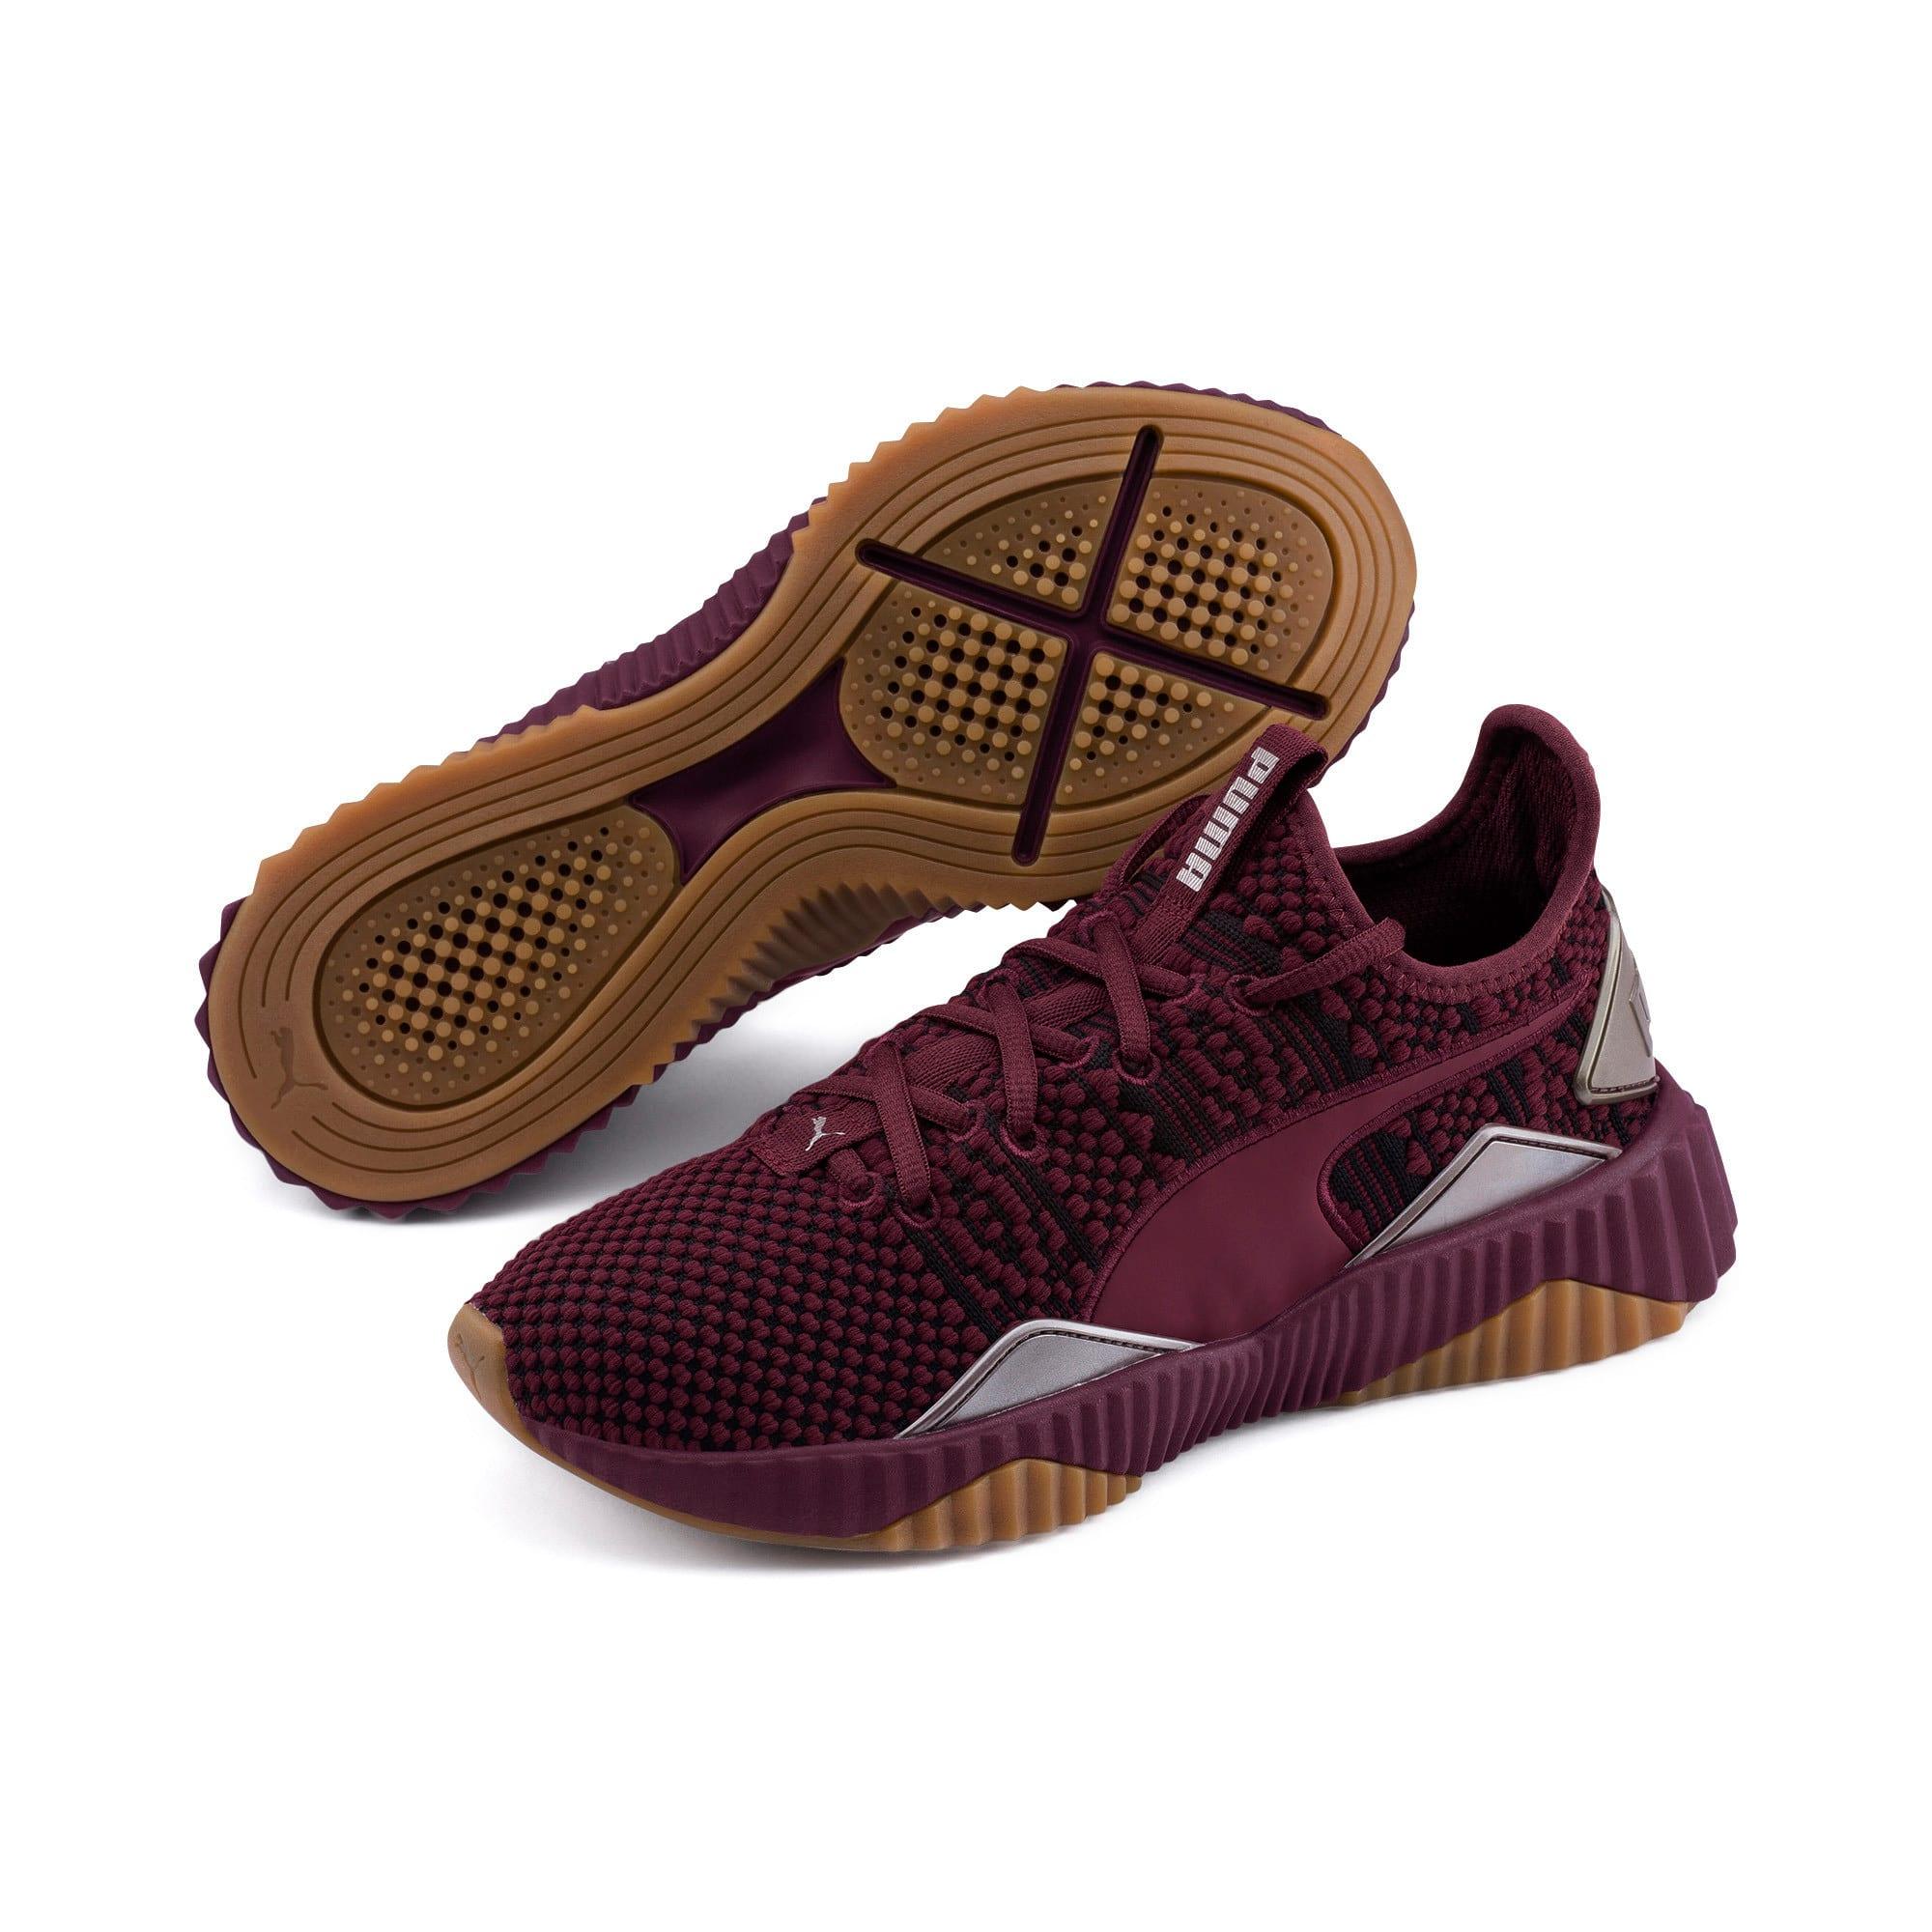 Thumbnail 2 of Defy Luxe Women's Training Shoes, Fig-Metallic Ash, medium